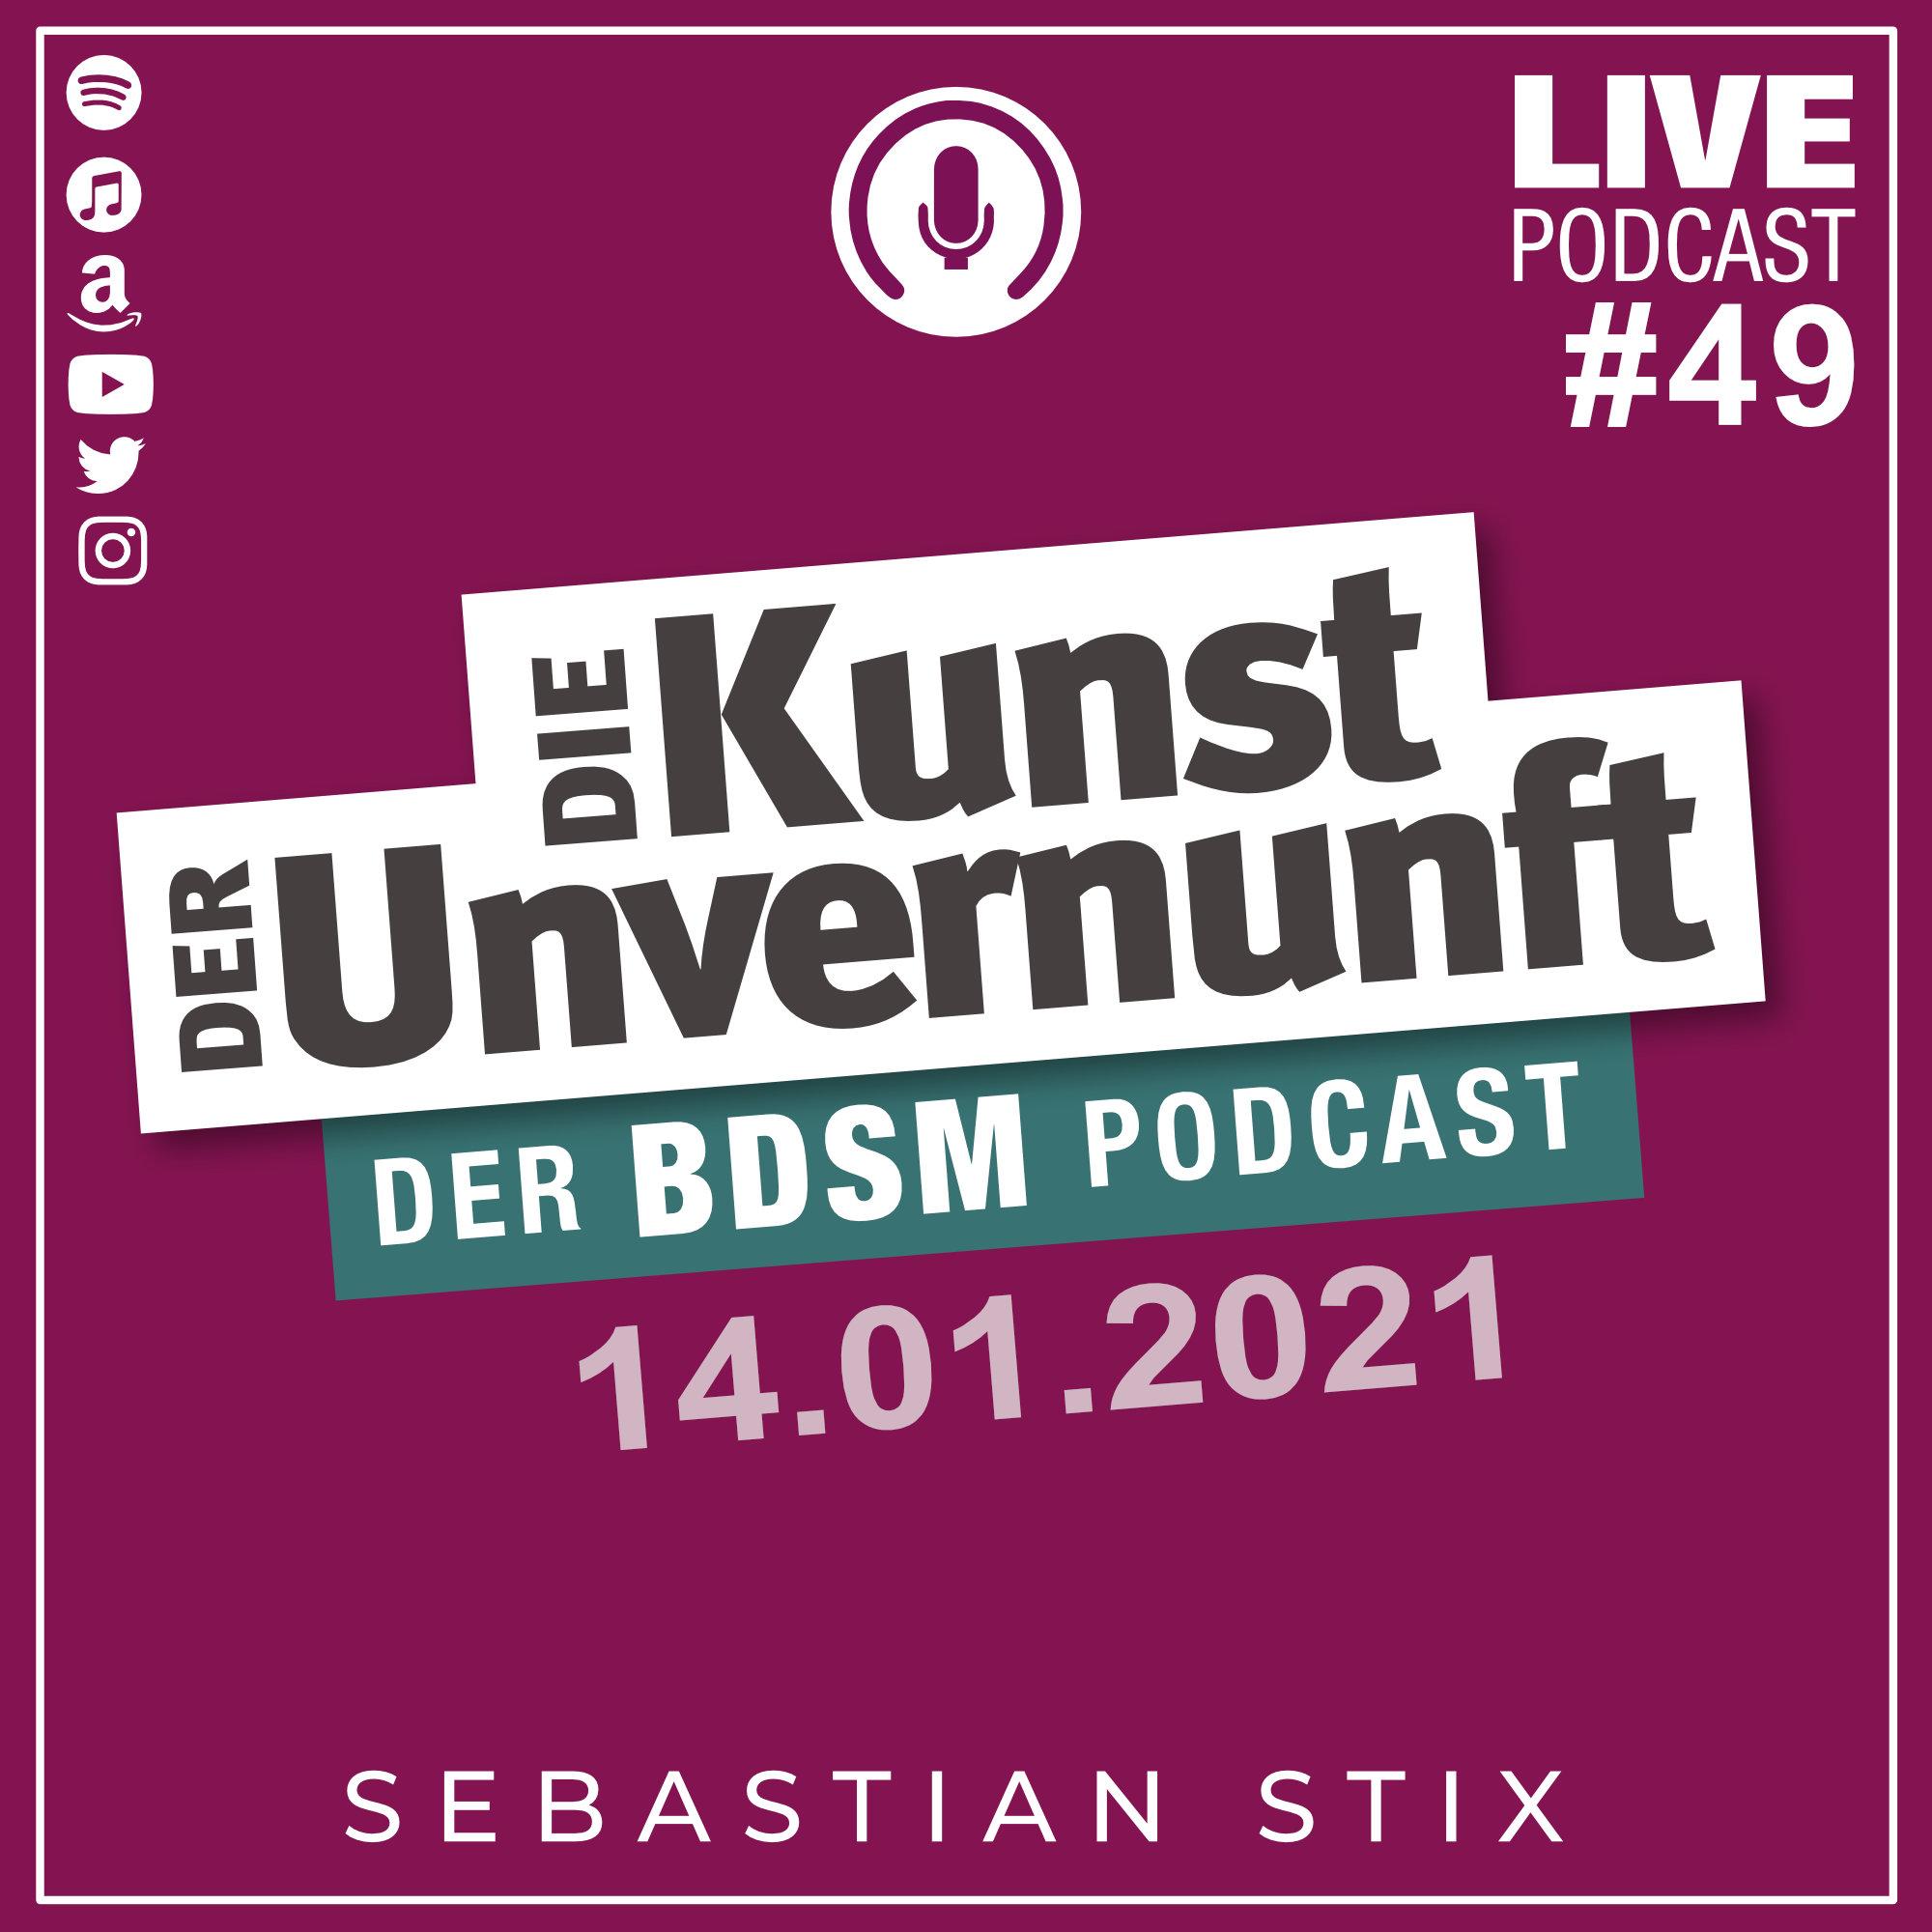 Unvernunft Live 14.01.2021 - BDSM & Behinderung